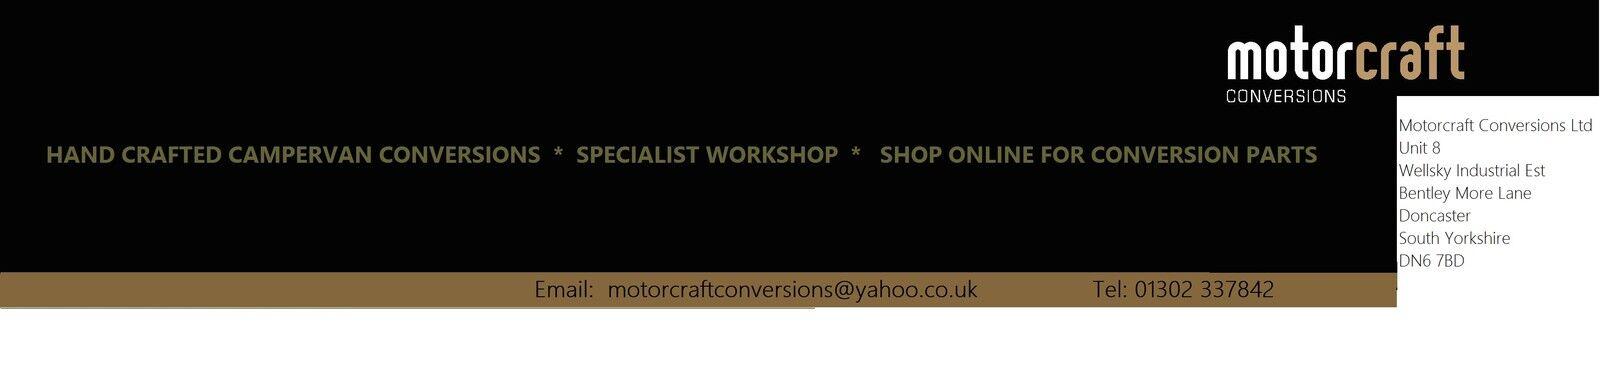 motorcraft conversions